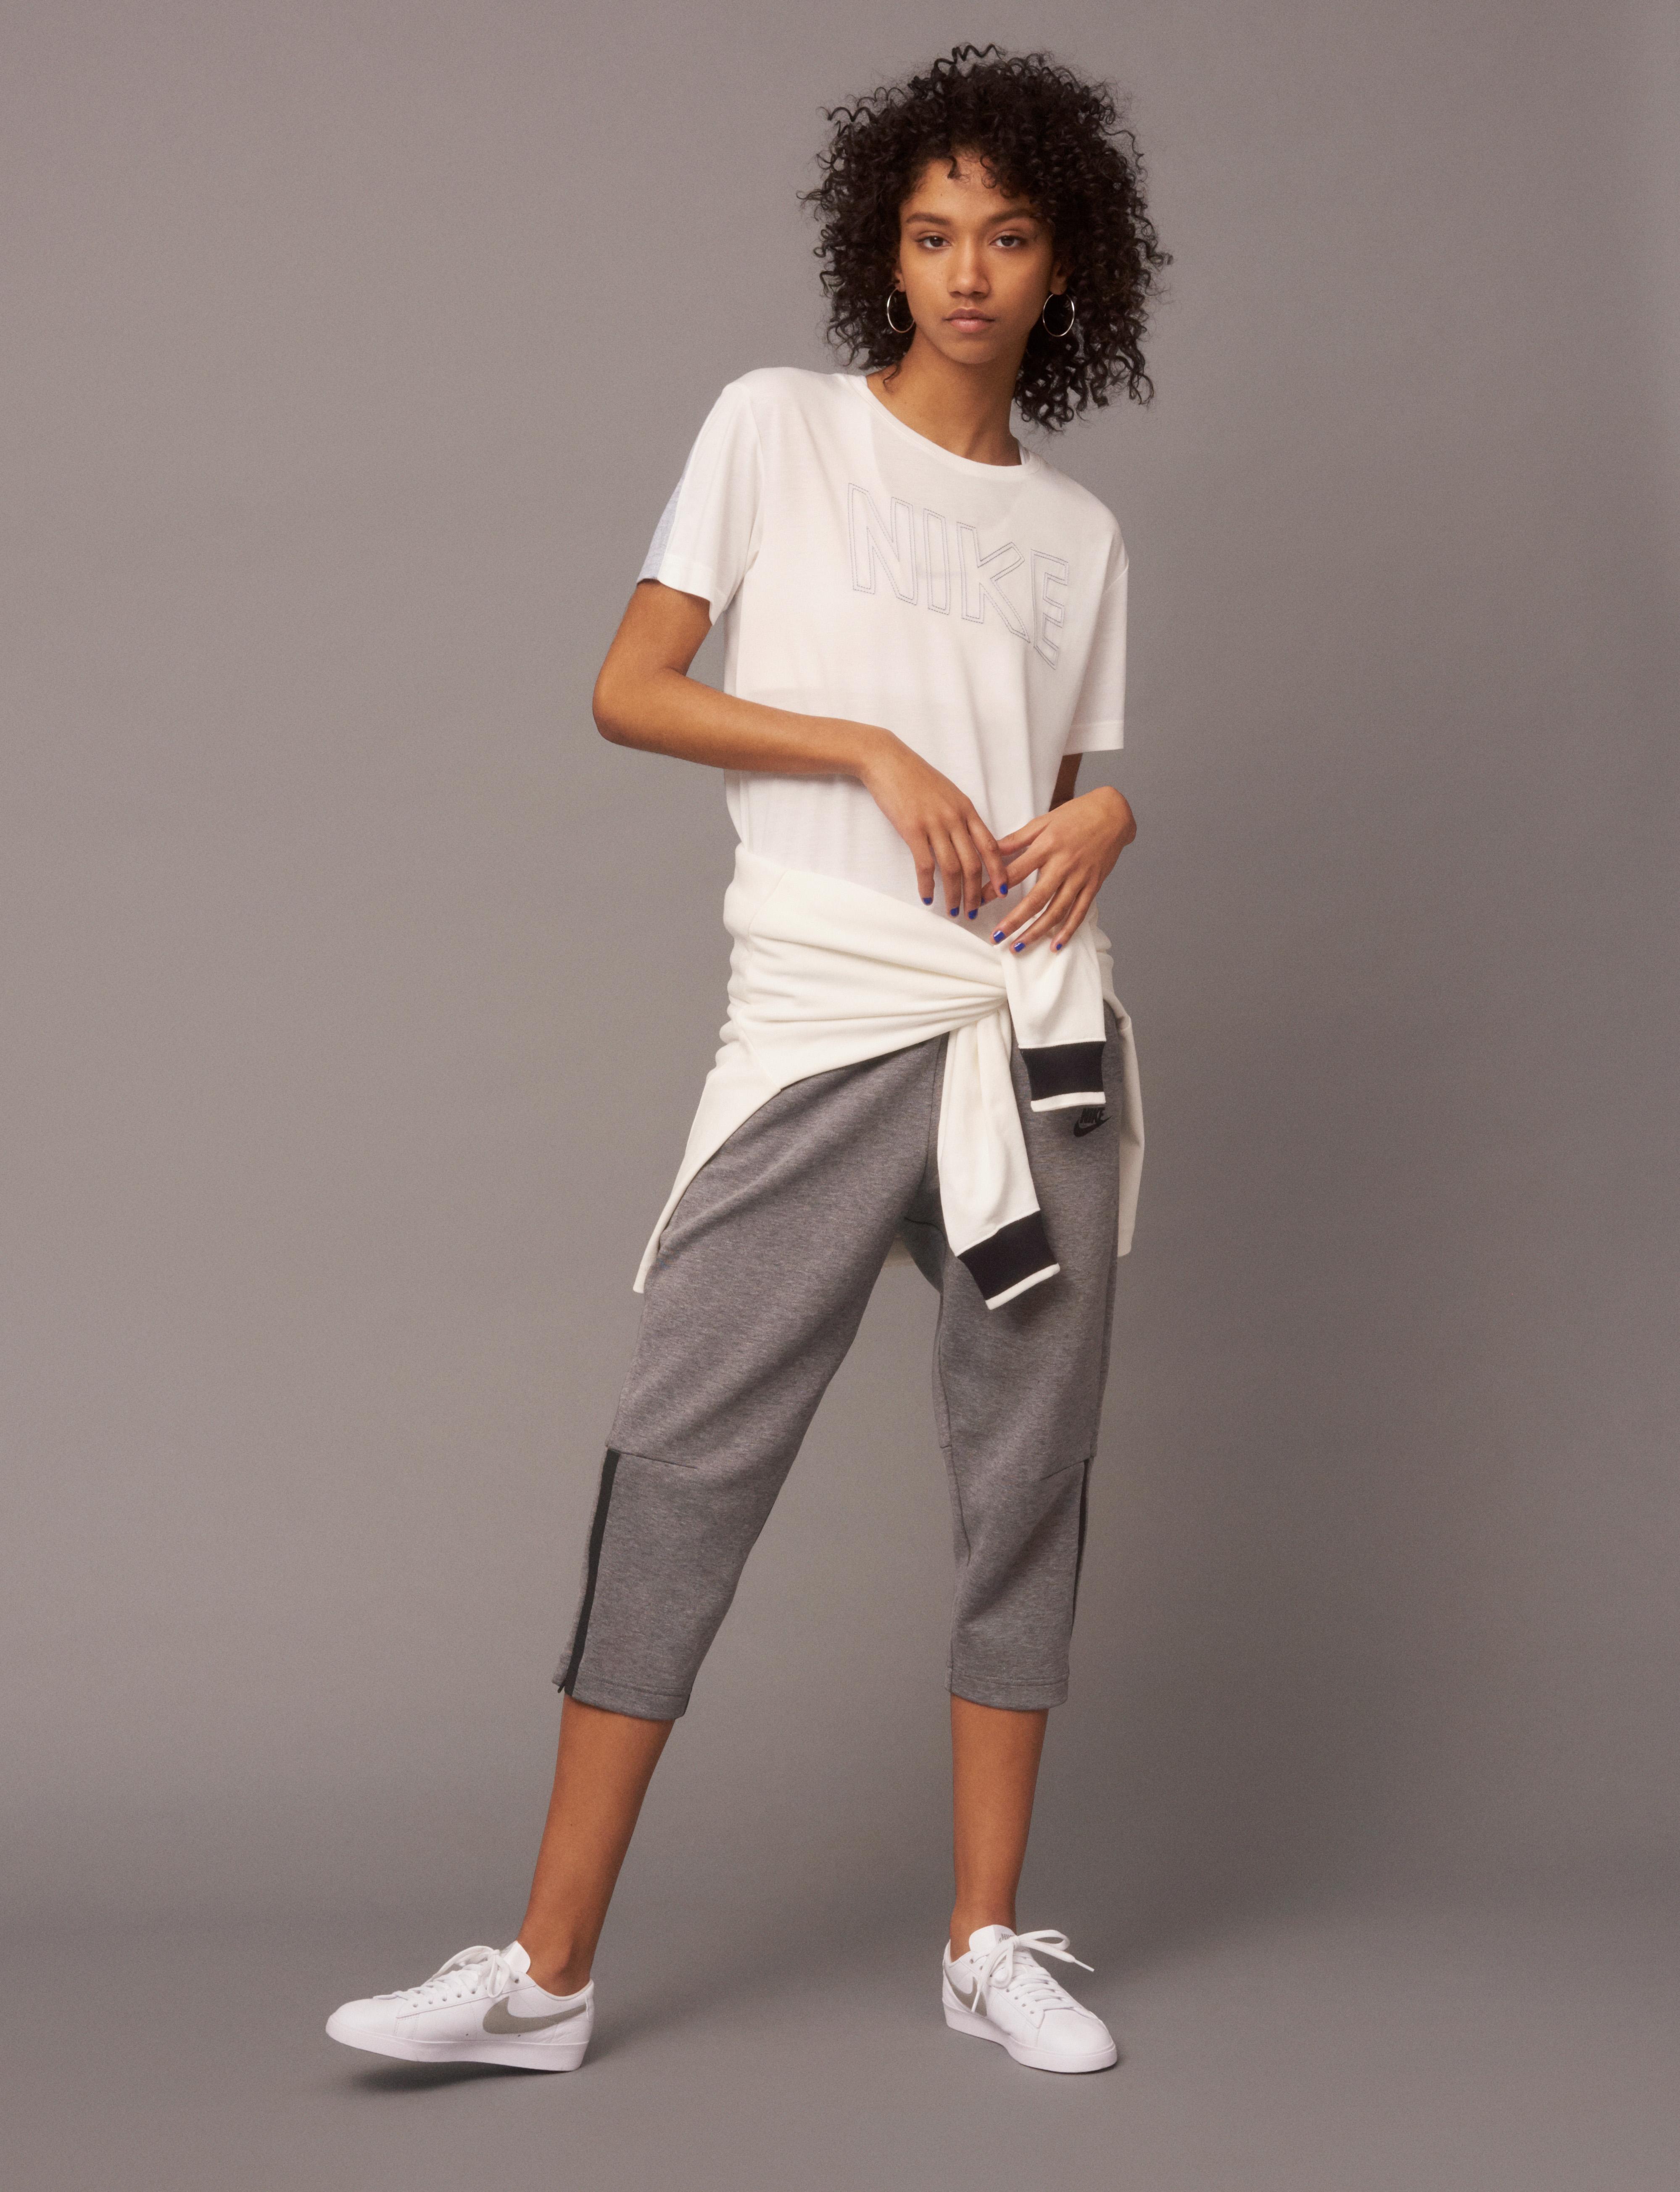 NikeWomen FA 17 Collection Look 14